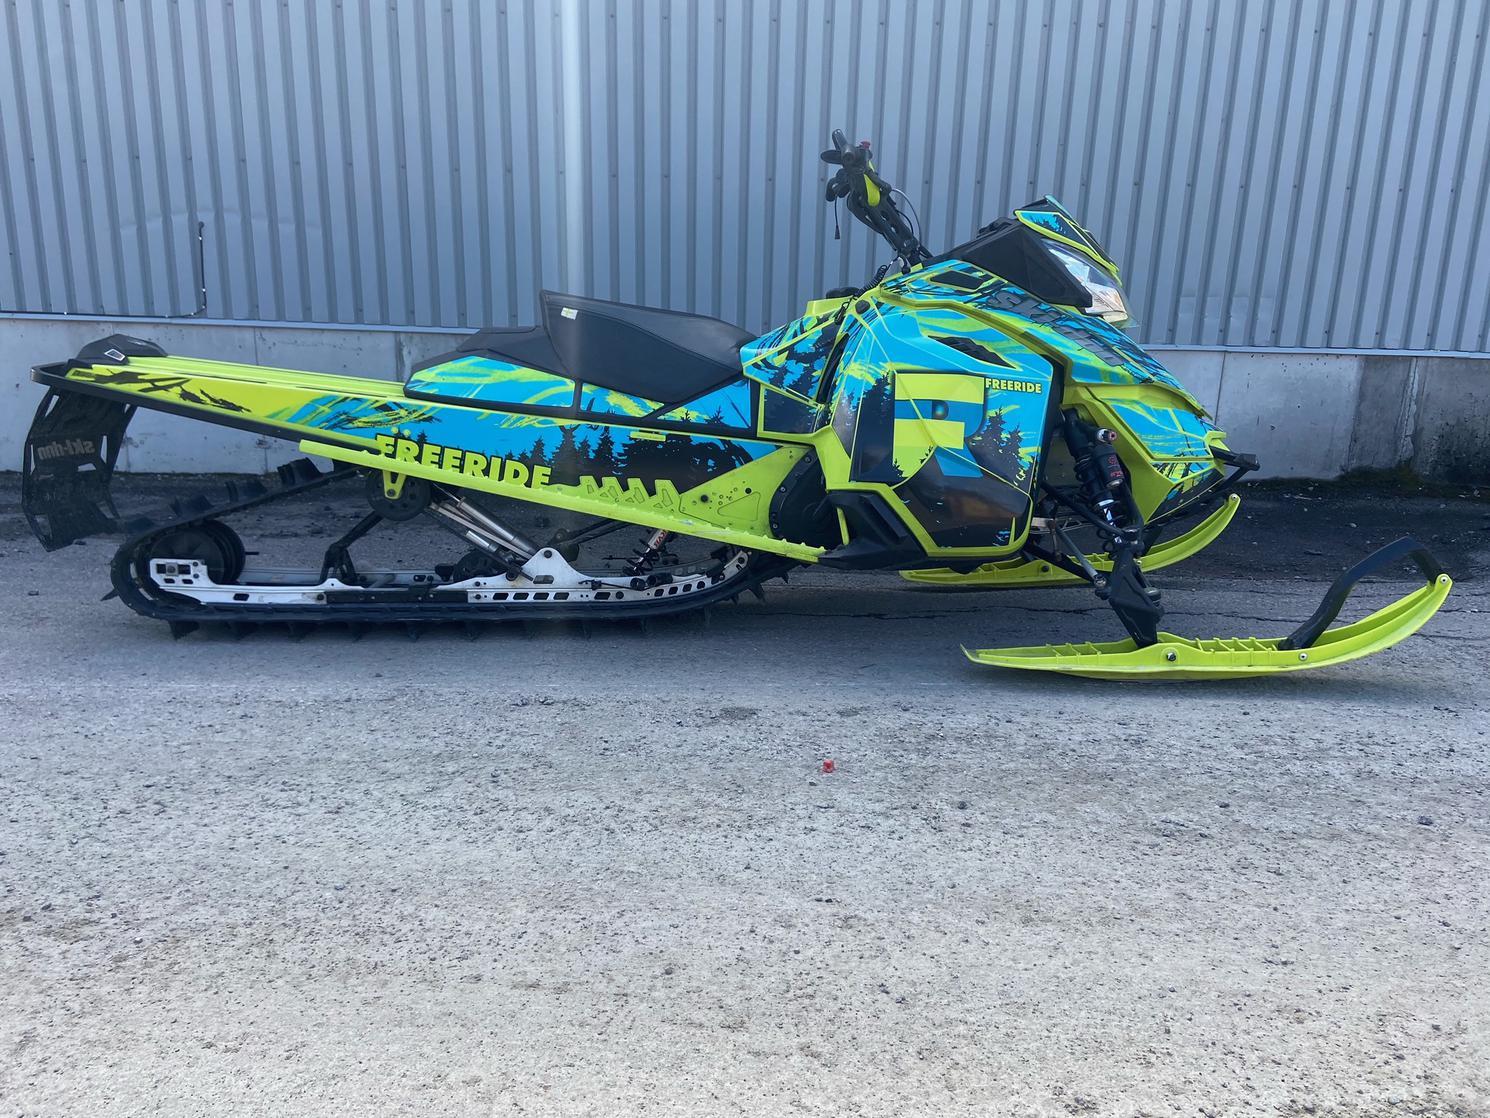 2015 Ski-Doo FREERIDE 800 ETEC 154